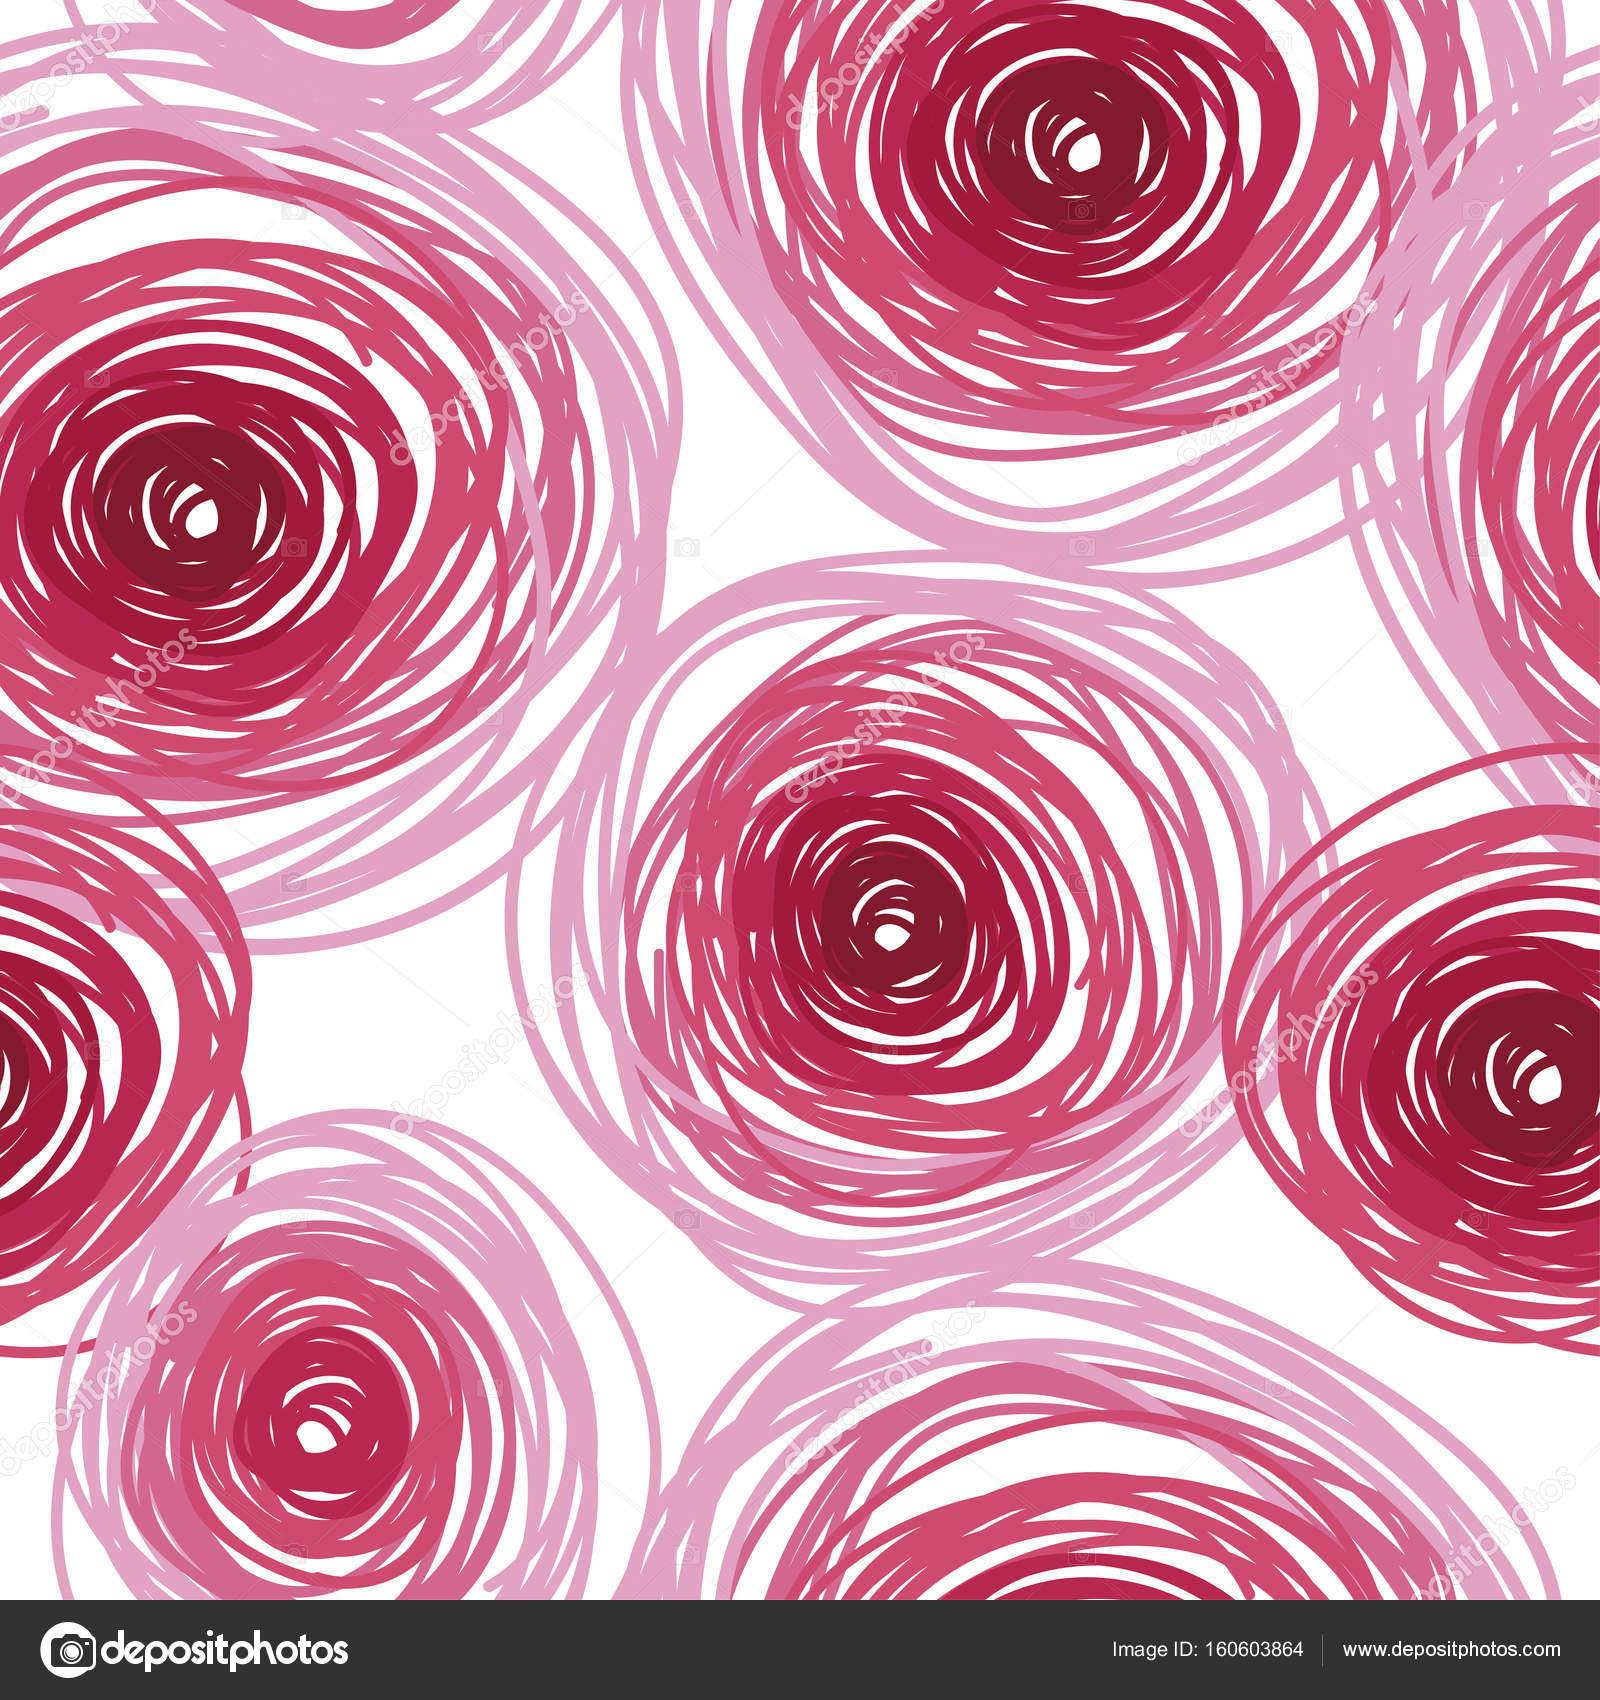 Ornamento De Azulejos Rosas Abstratas Vetores De Stock - Azulejos-rosas